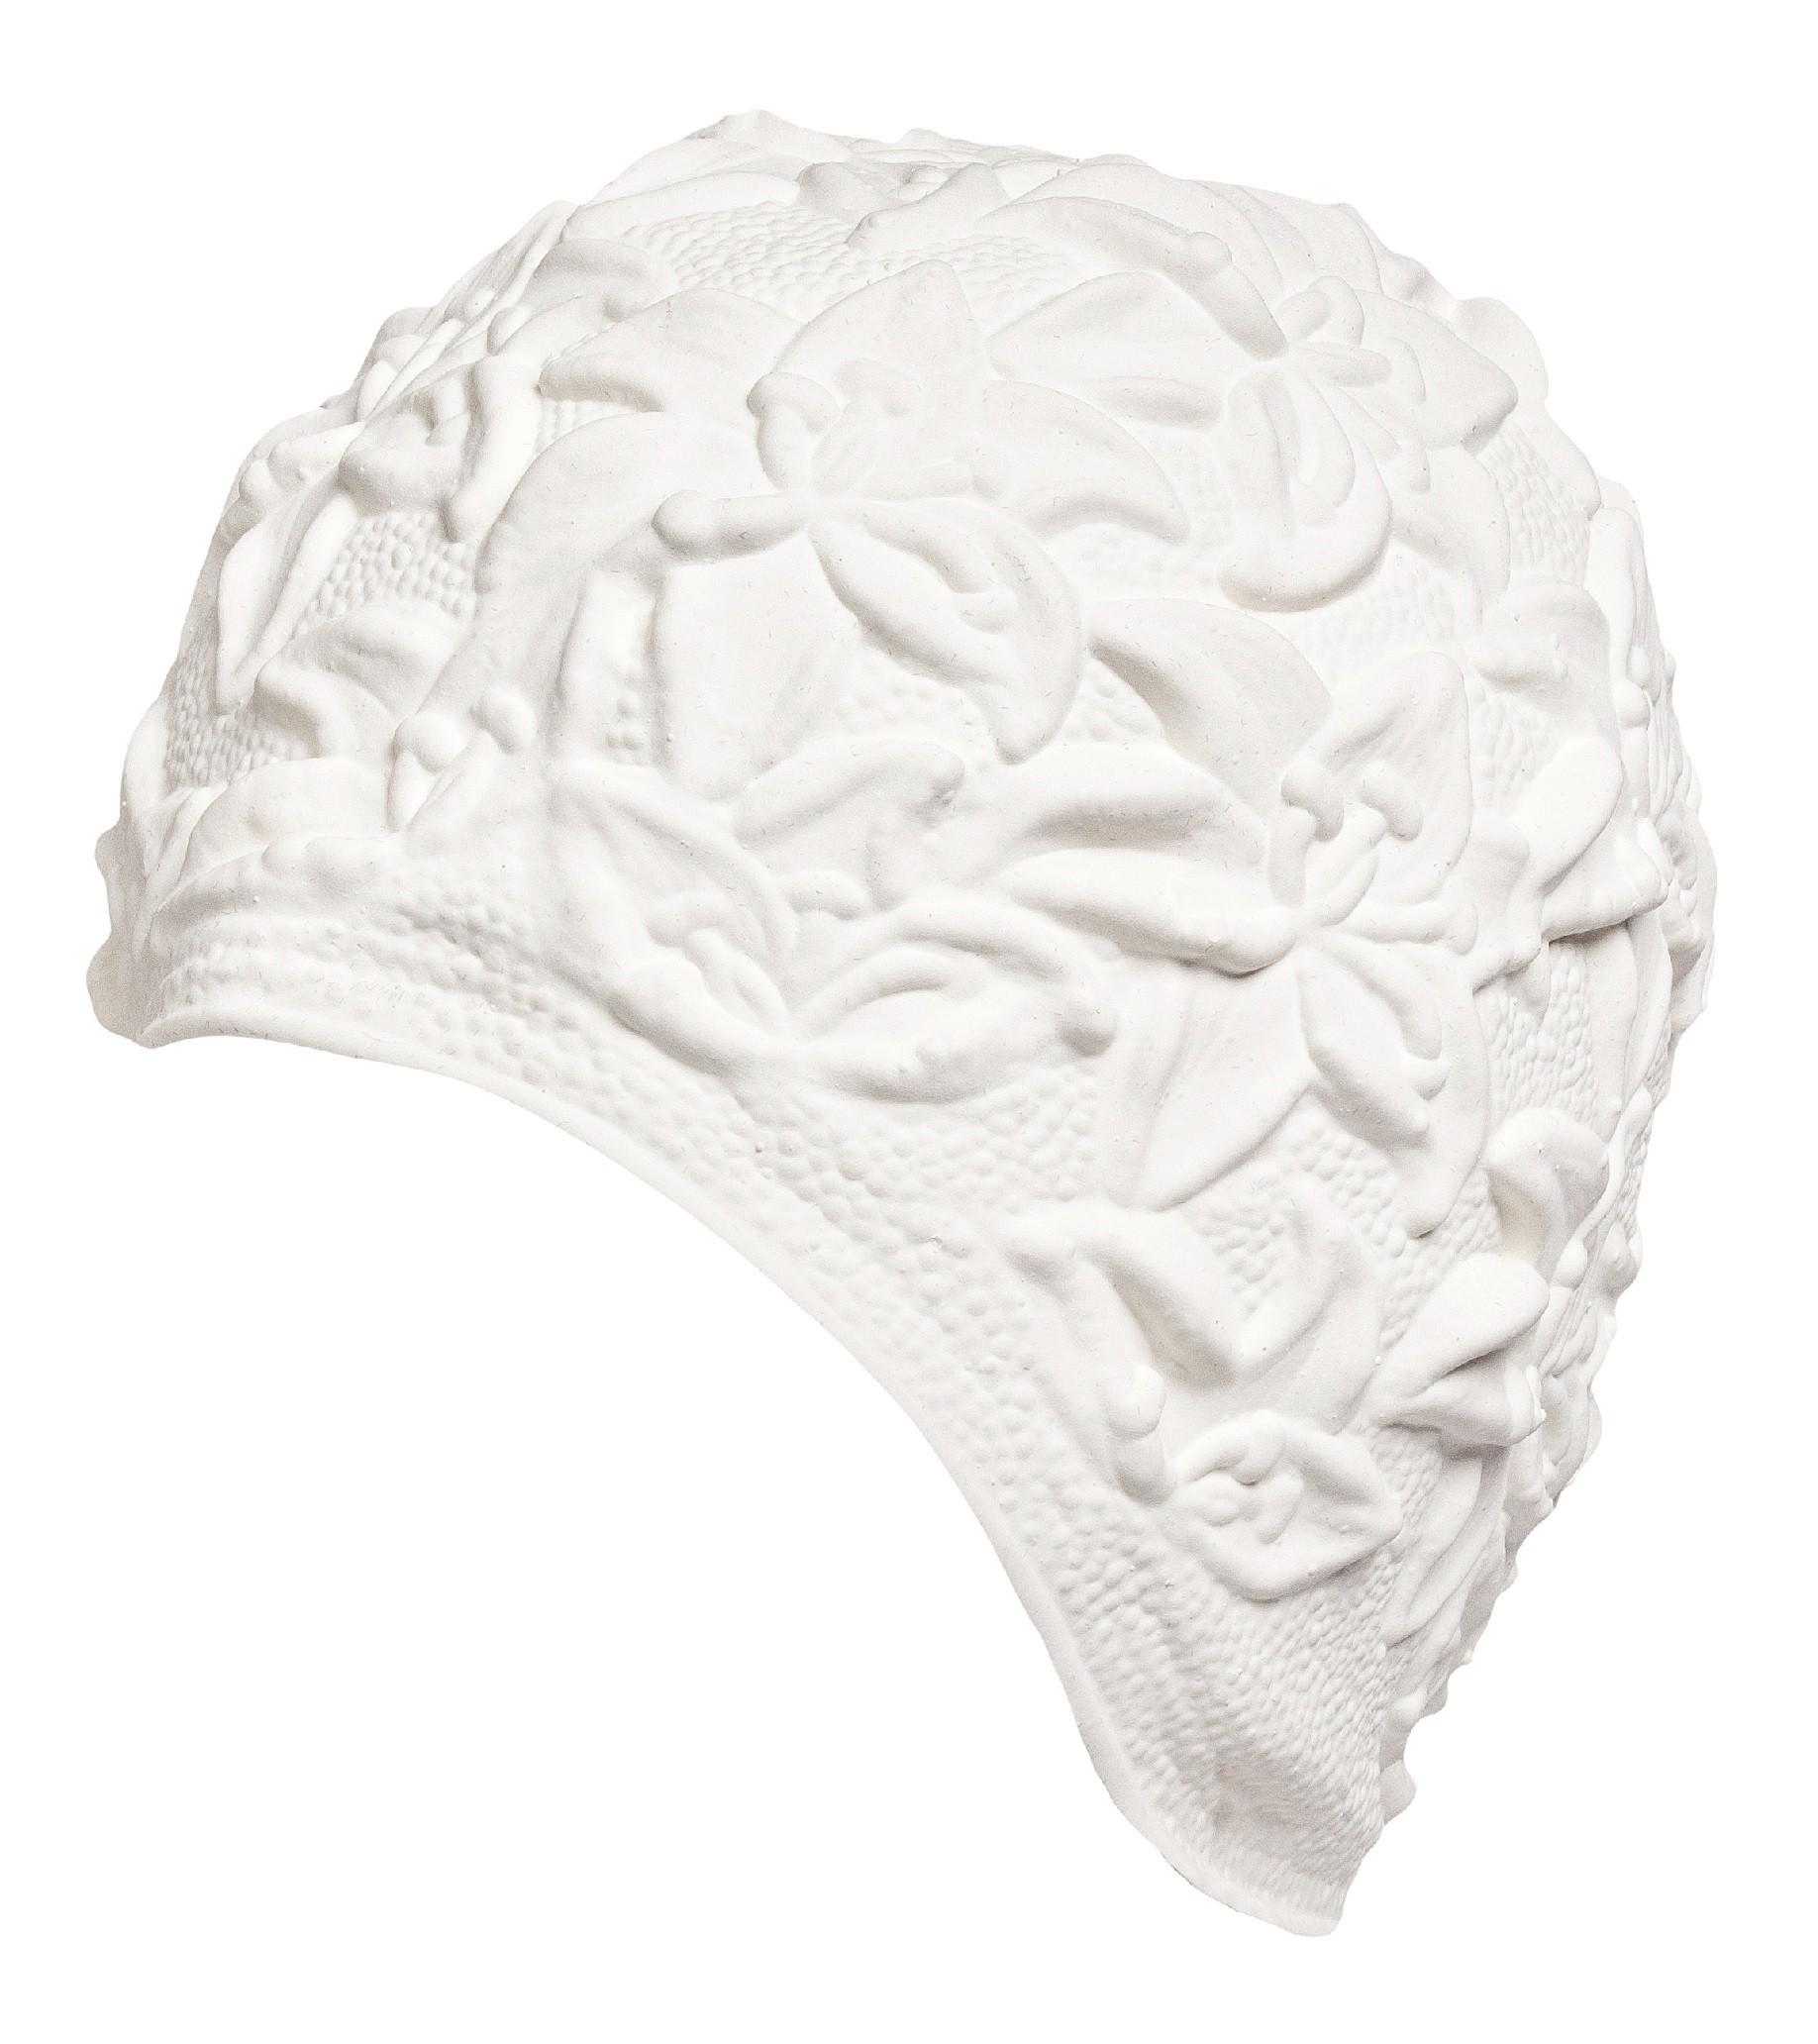 Úszósapka Latex - fehér liliomos - CanCan fa7f7736d2